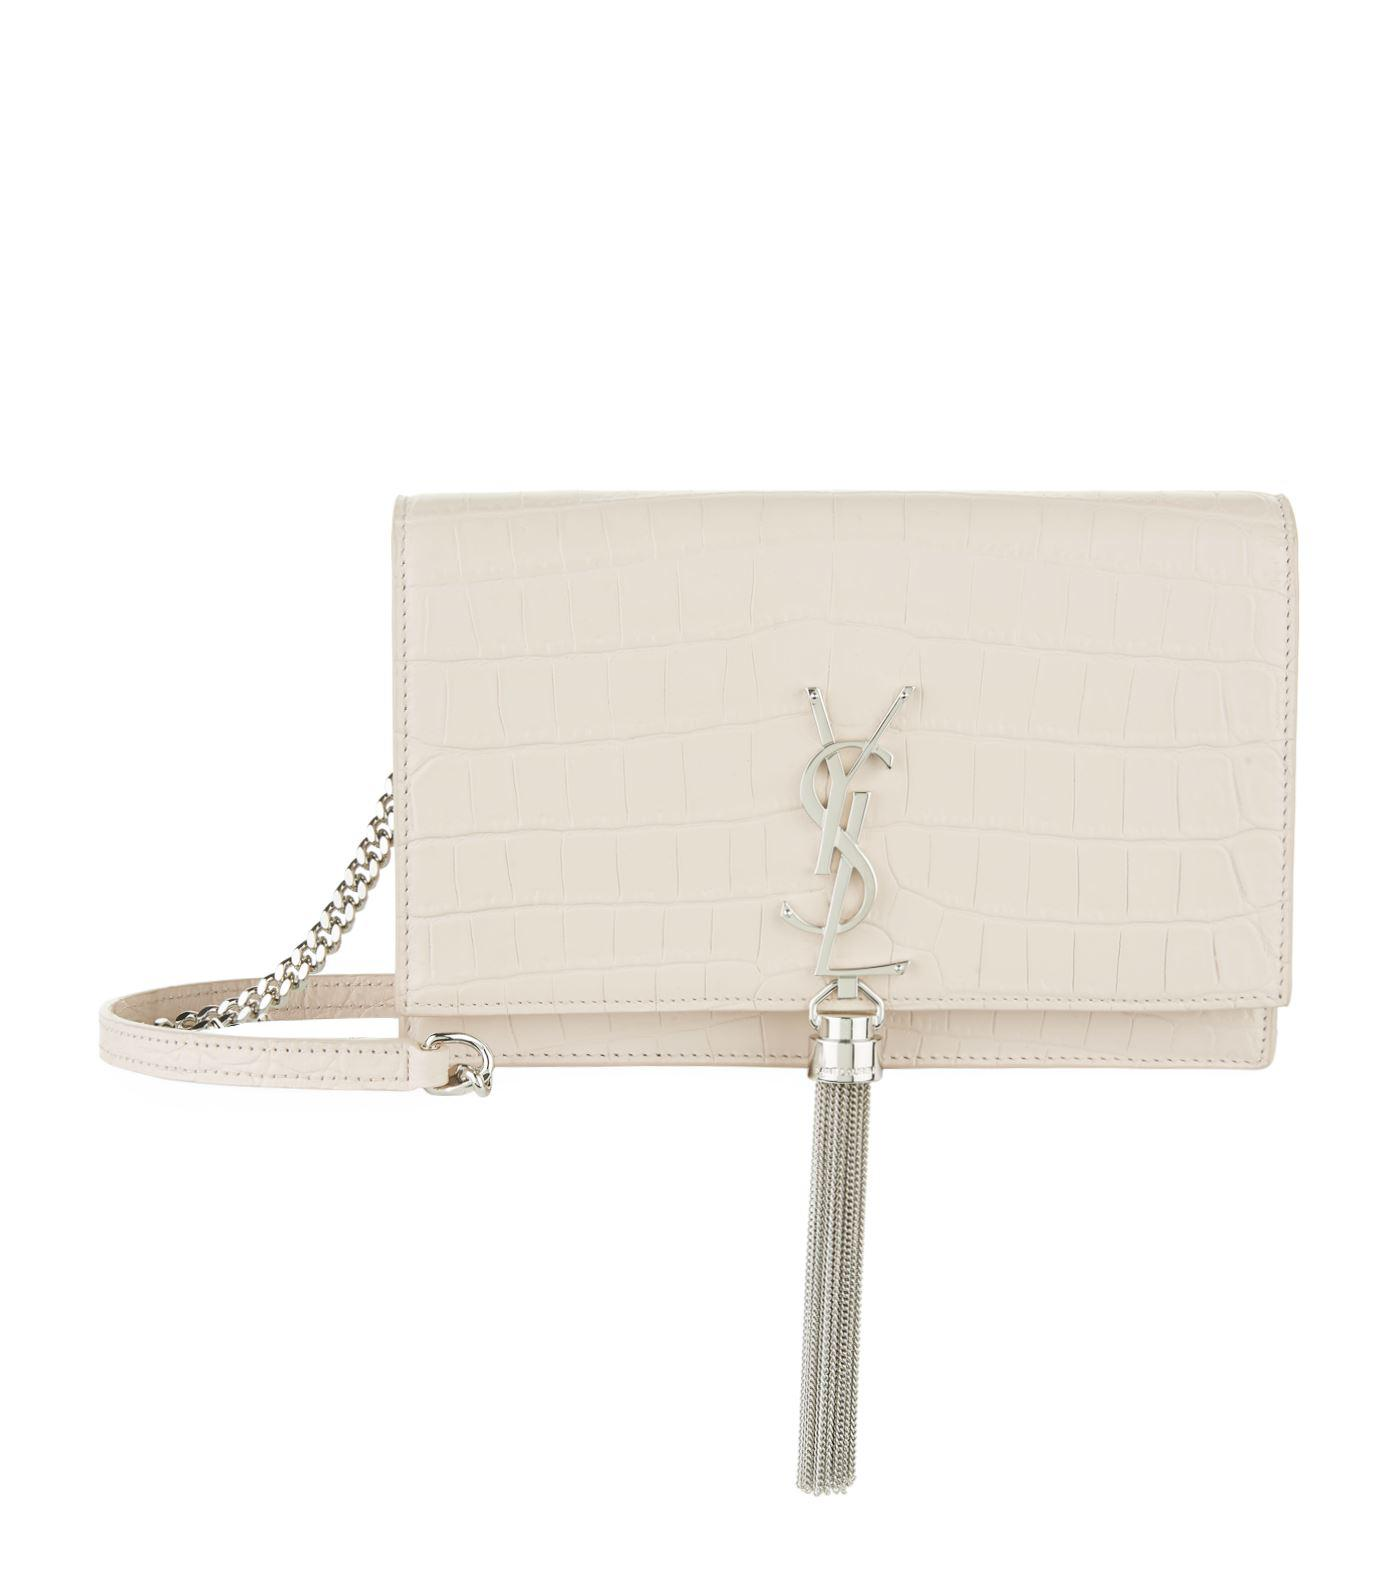 Lyst - Saint Laurent Mini Croc-embossed Kate Tassel Shoulder Bag in Pink 8e2bccc7361de